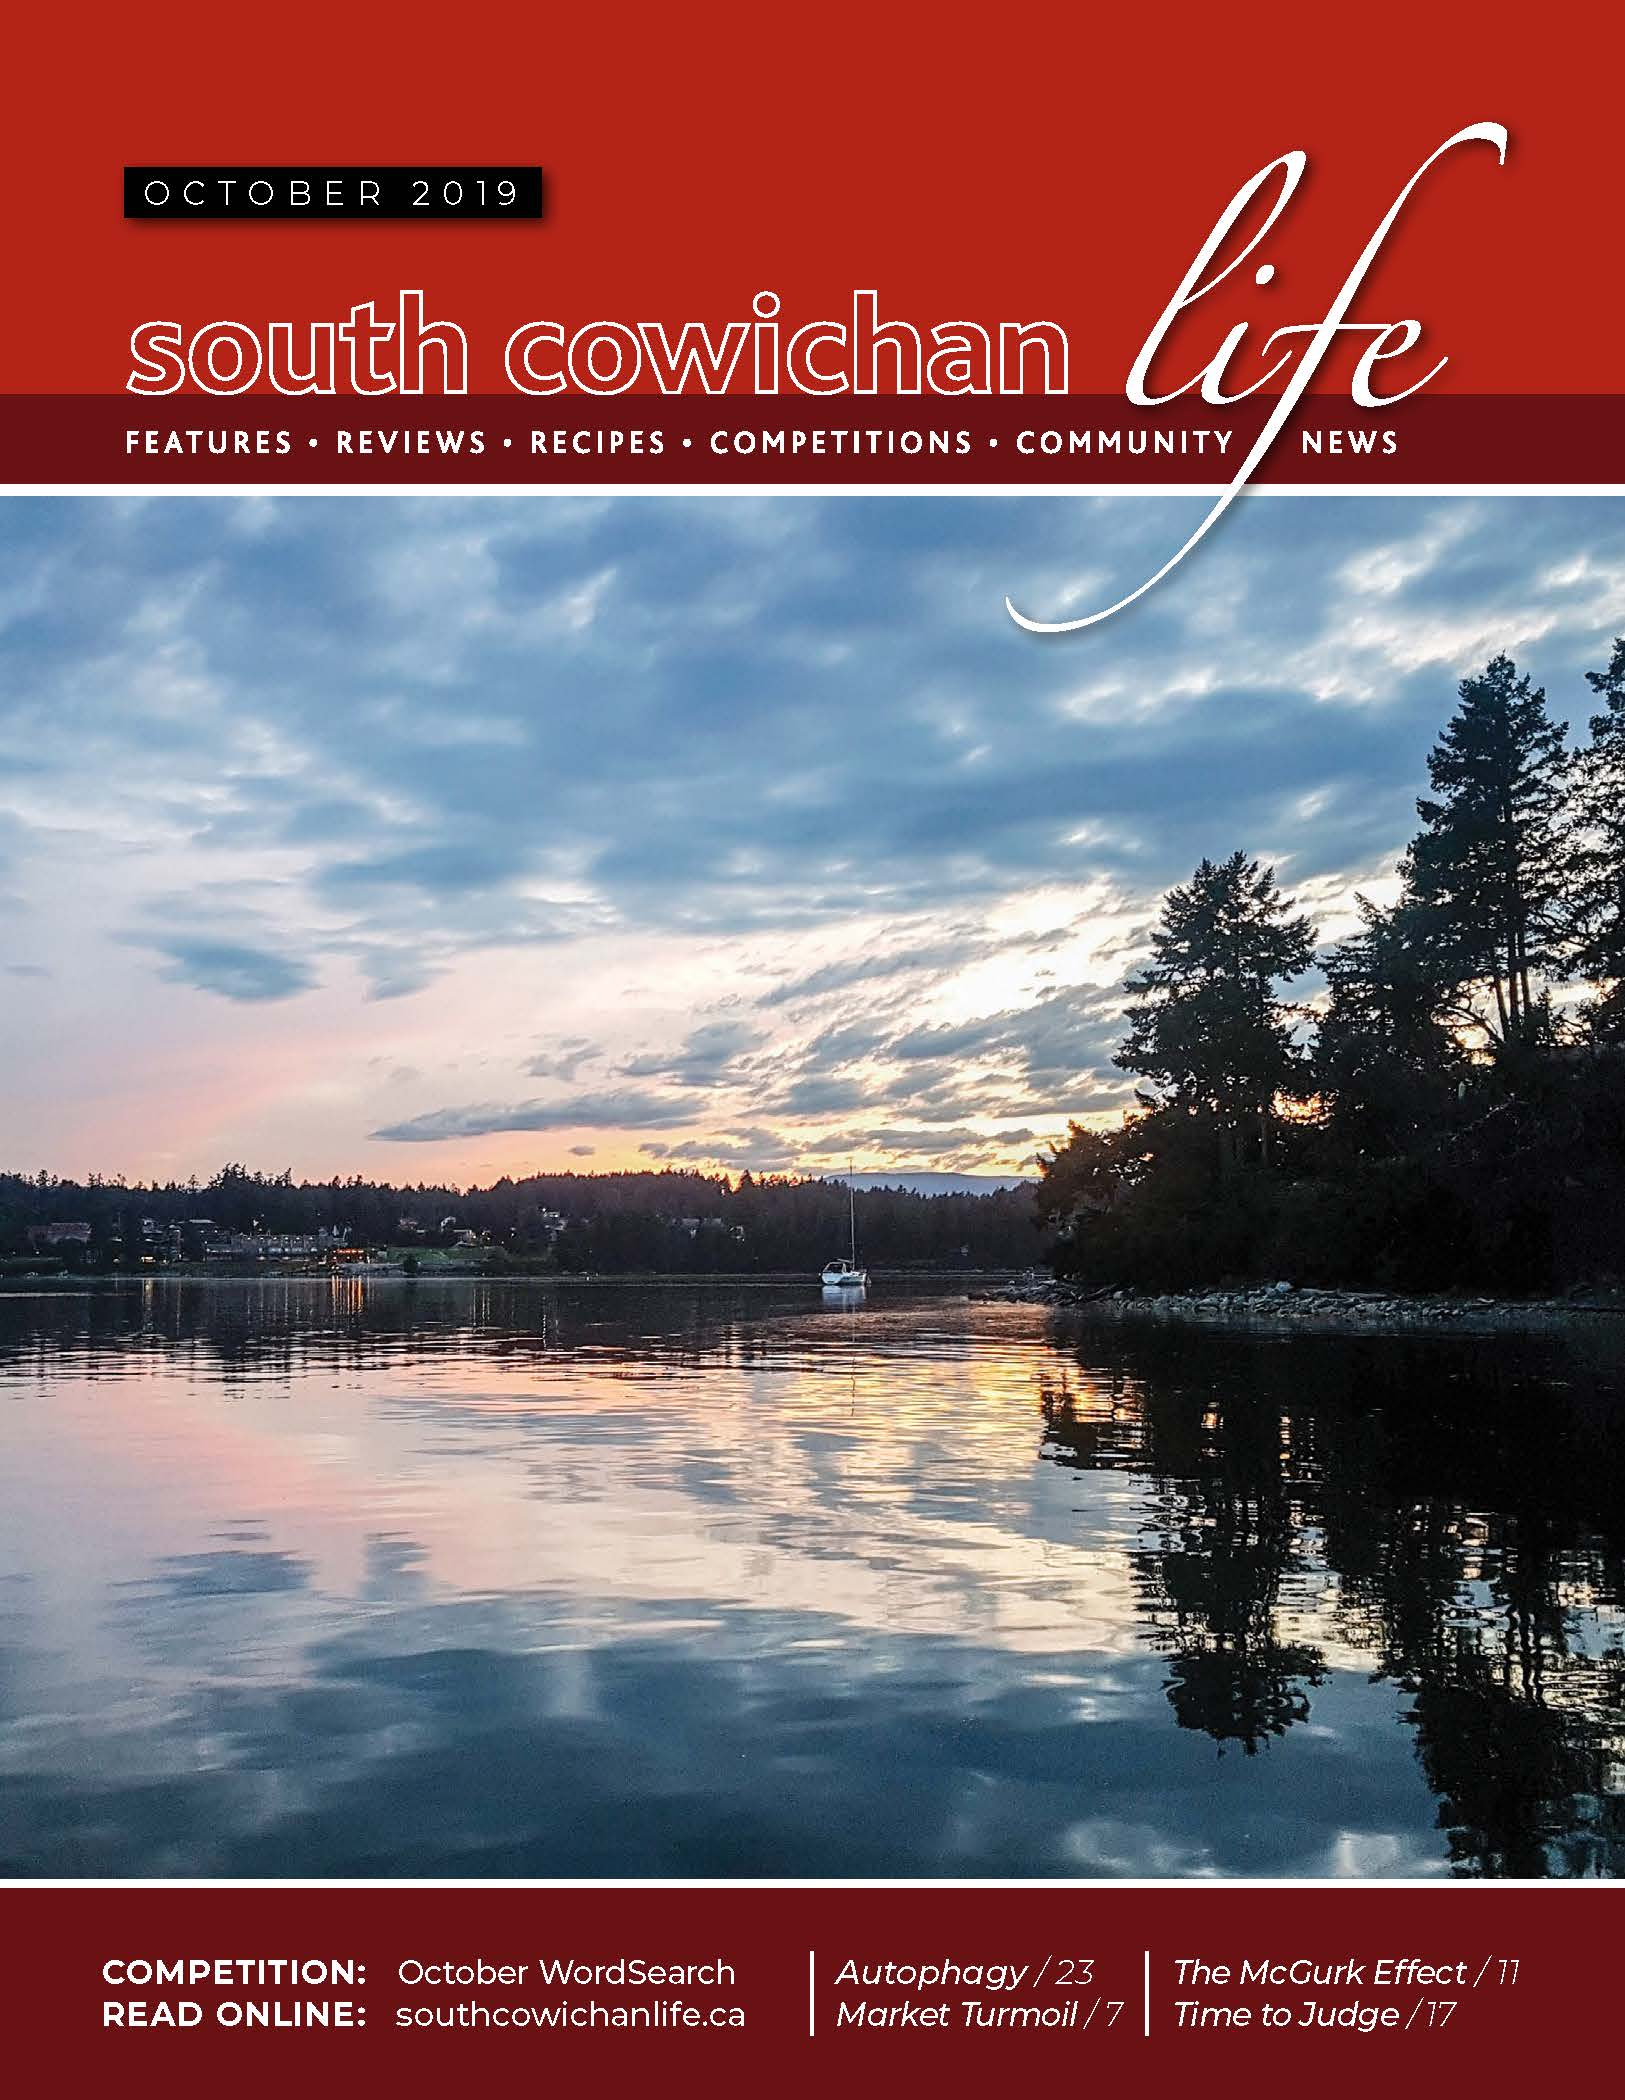 South Cowichan Life Oct 2019